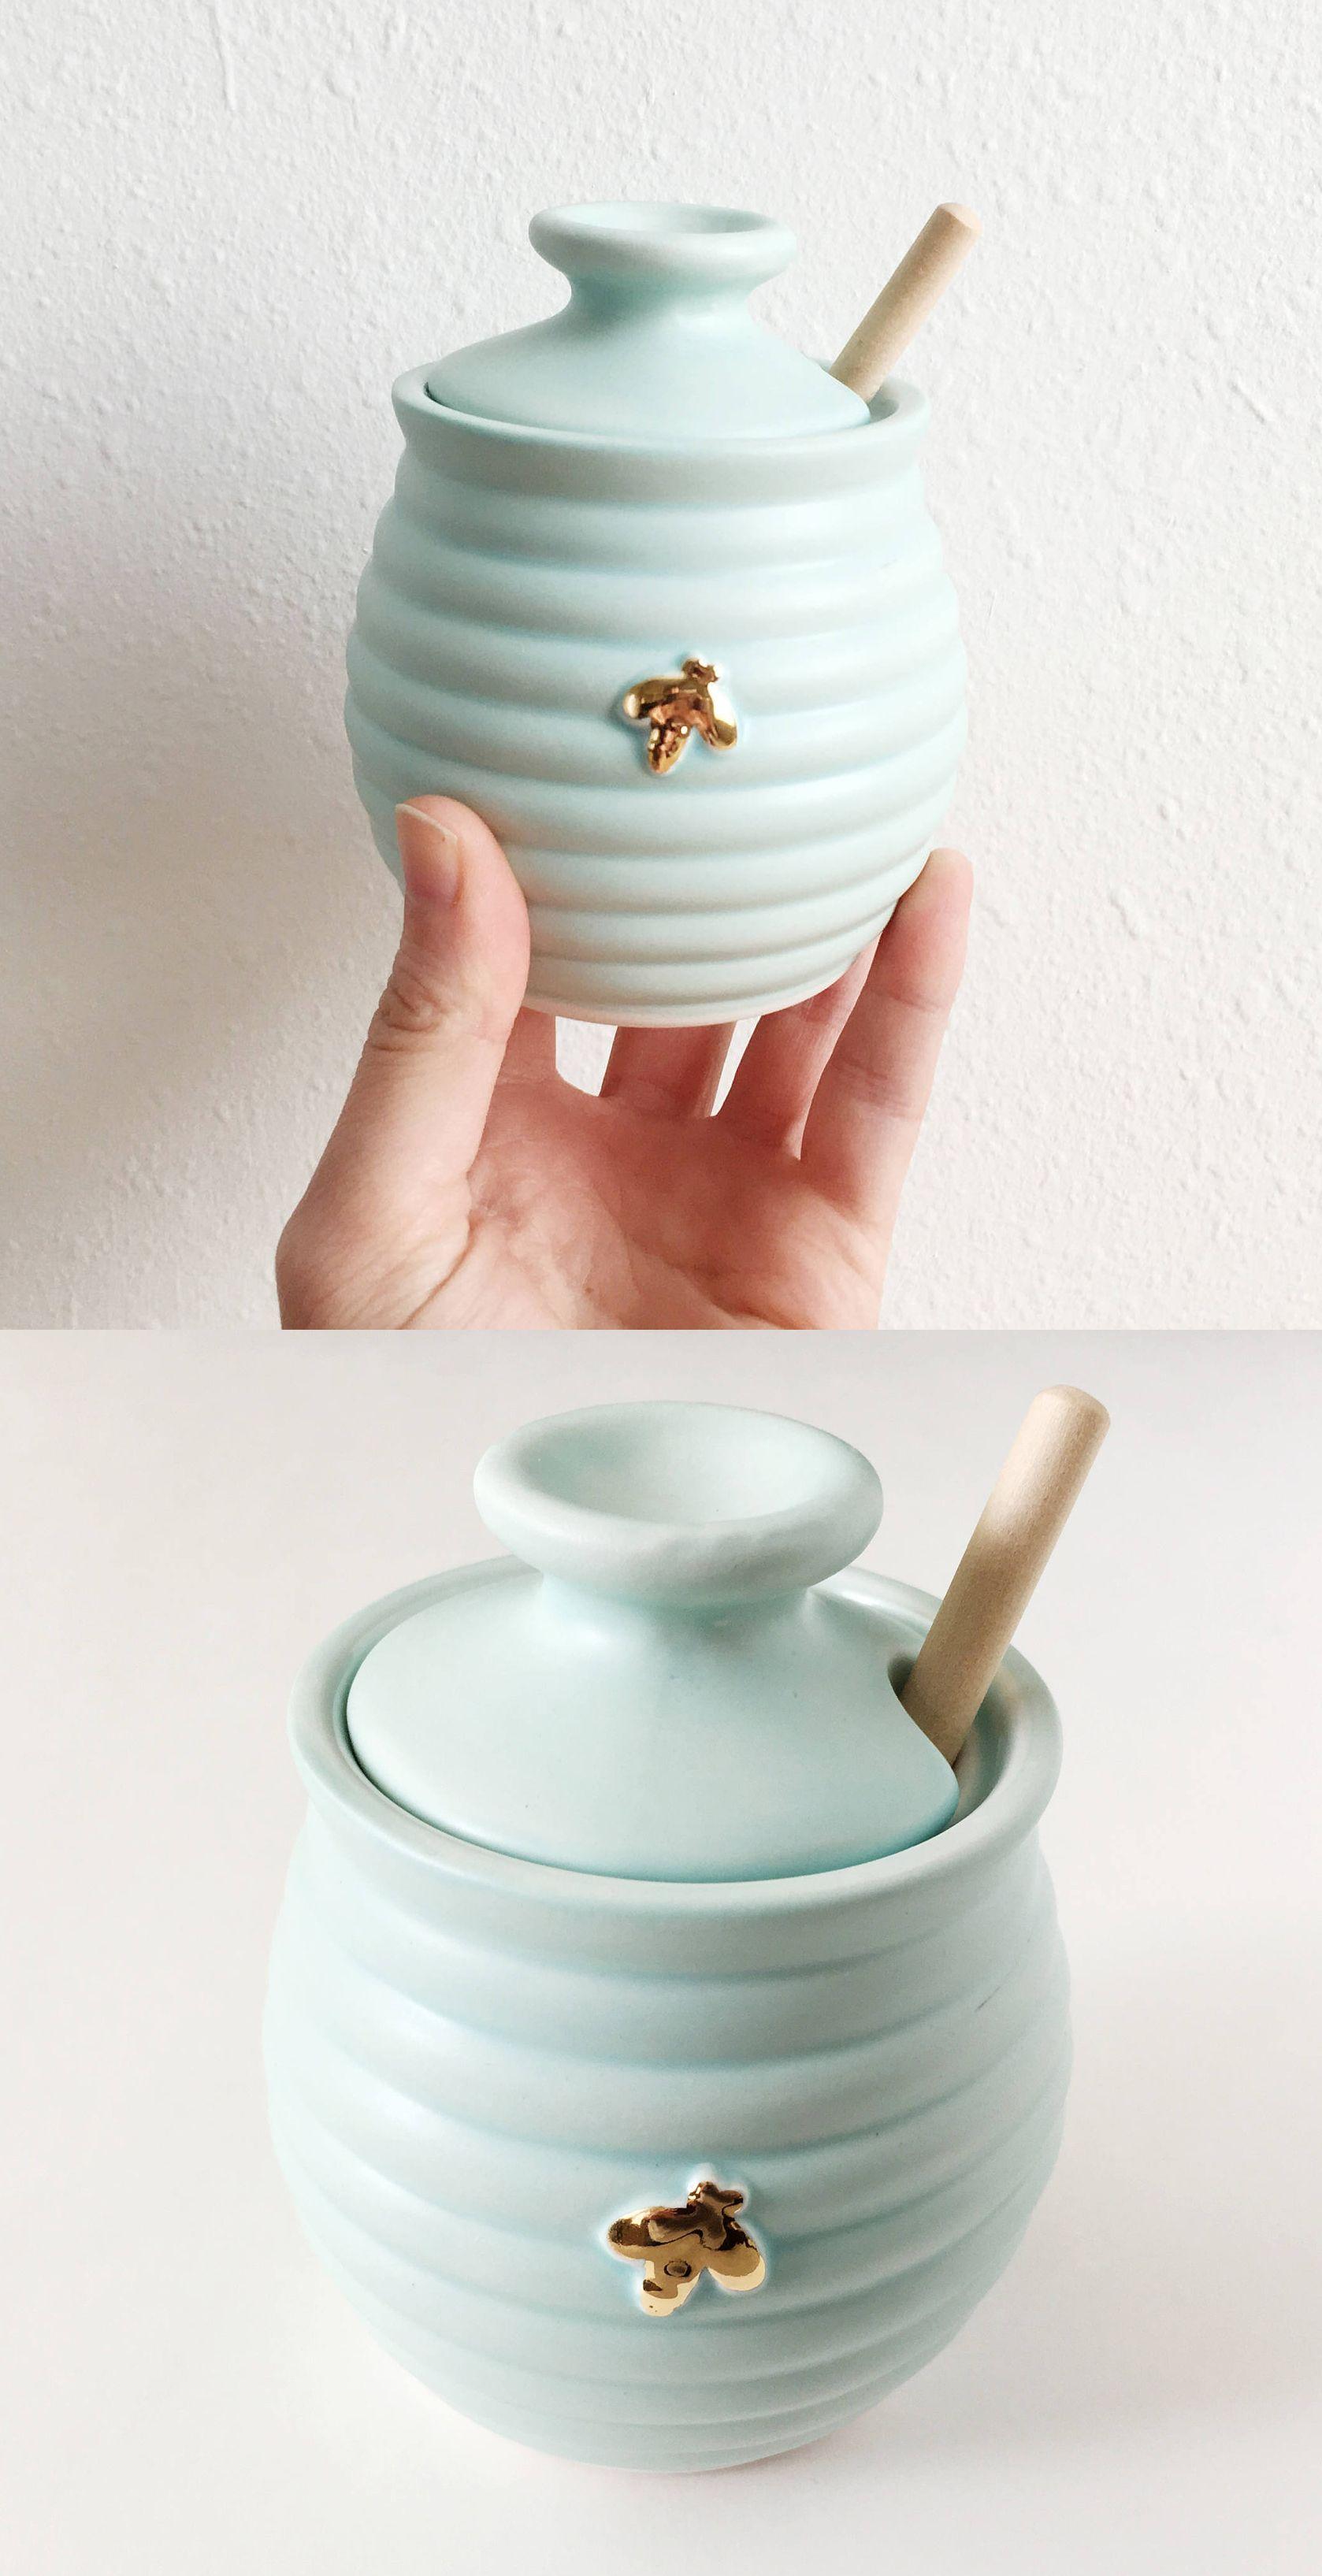 Honeybee Honeypot By Pottery Lodge Aesthetic Pinterest  # Muebles Novella